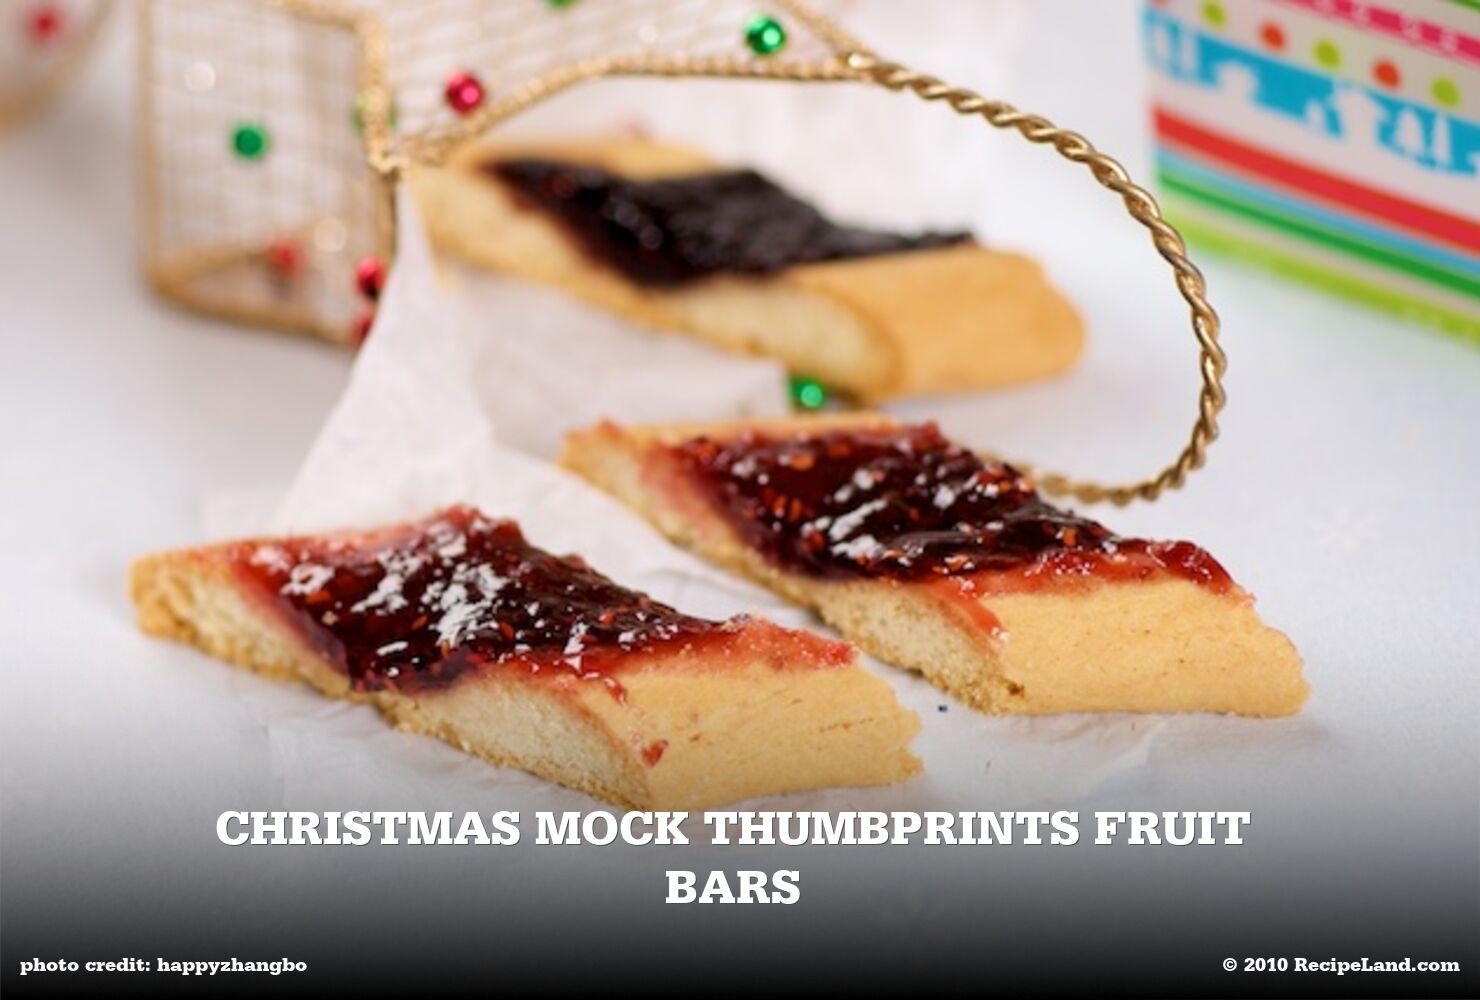 Christmas Mock Thumbprints Fruit Bars